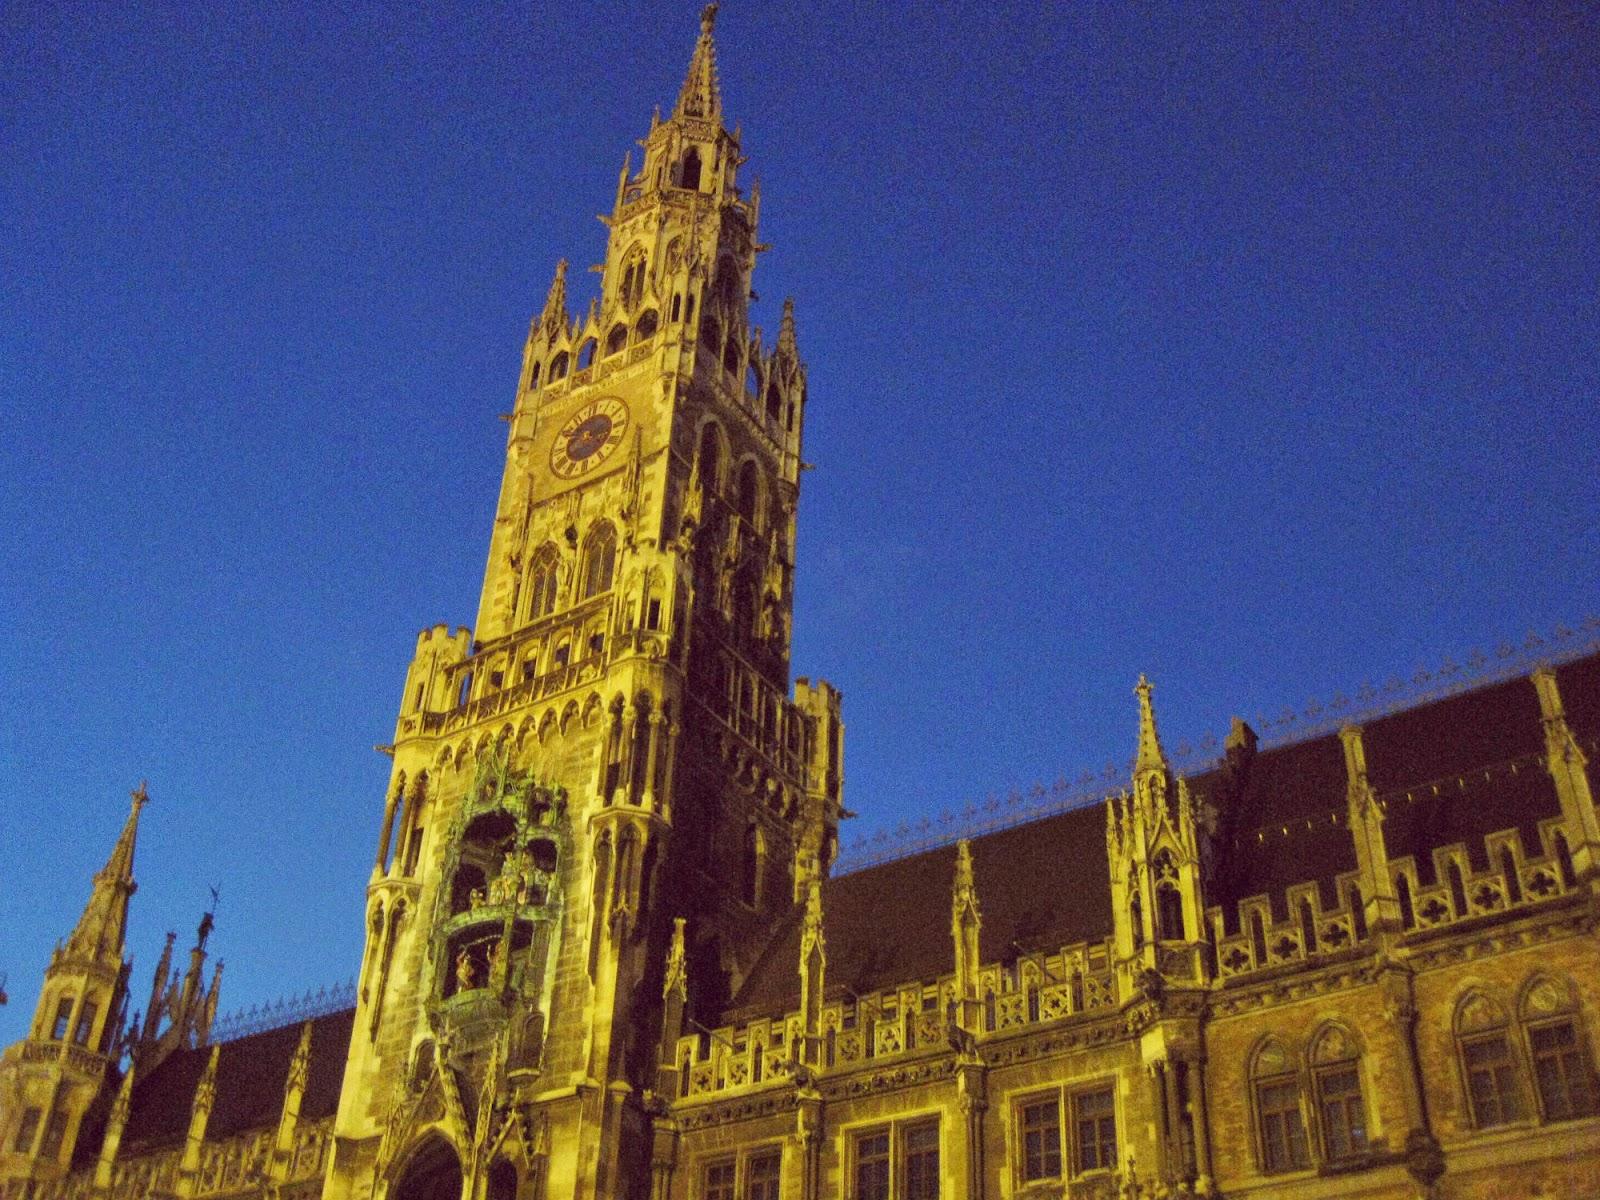 Munich Rathaus at night